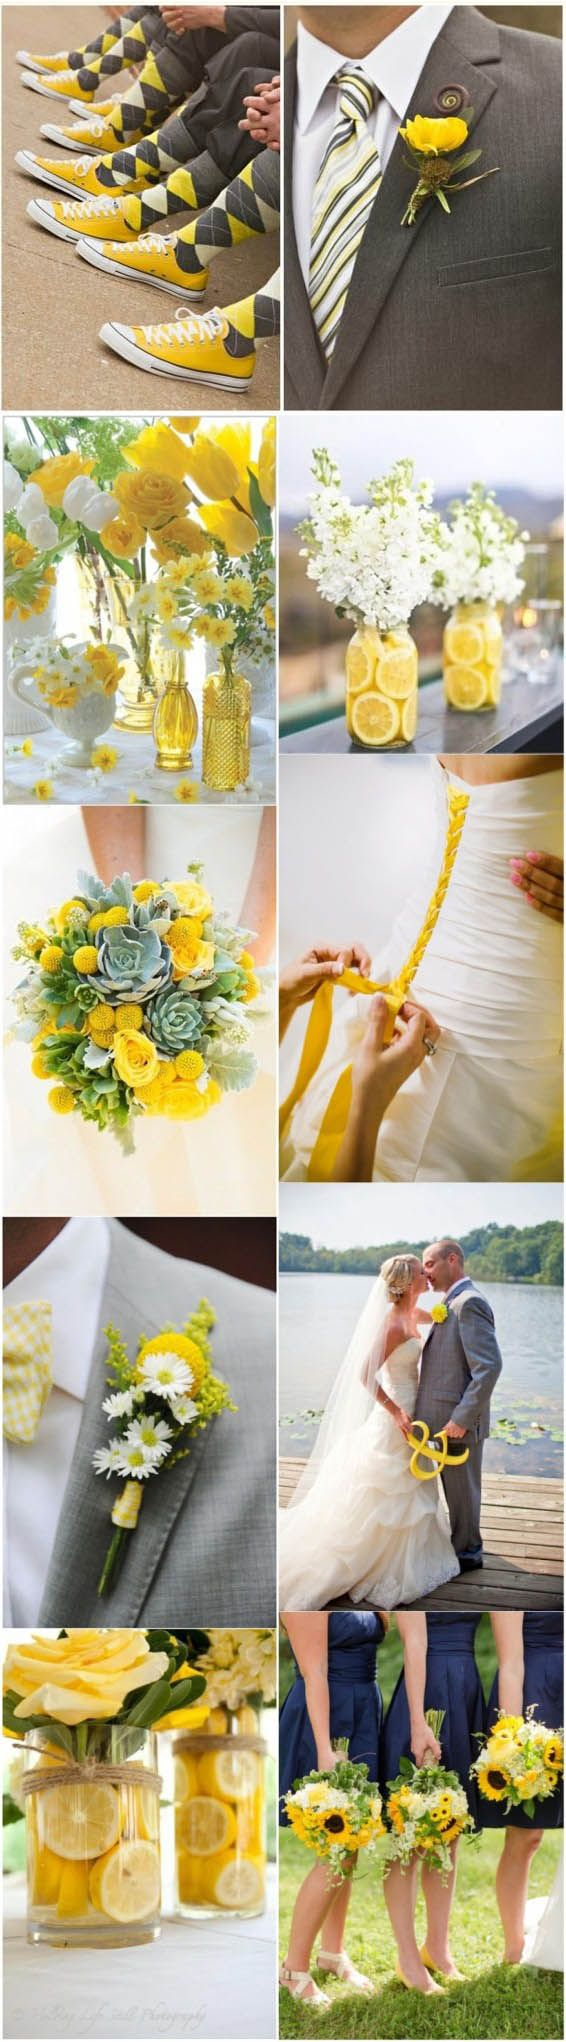 Wedding ideas spring   Spring Wedding Color and Ideas  MELLOW  Pinterest  Spring